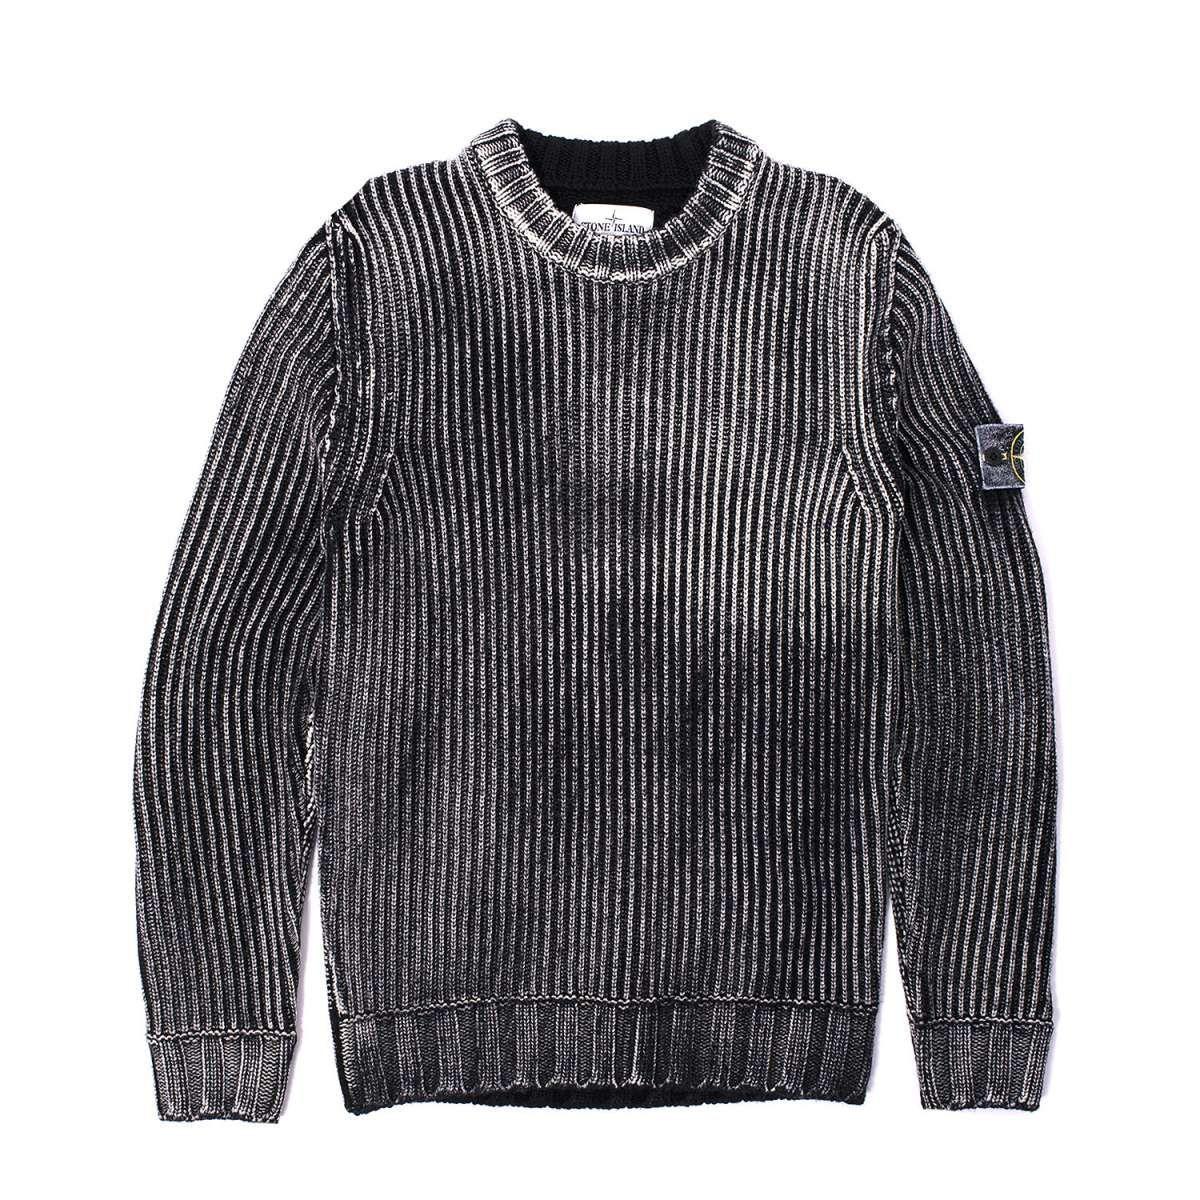 Stone Island Hand Corrosion Crewneck Knit Sweater